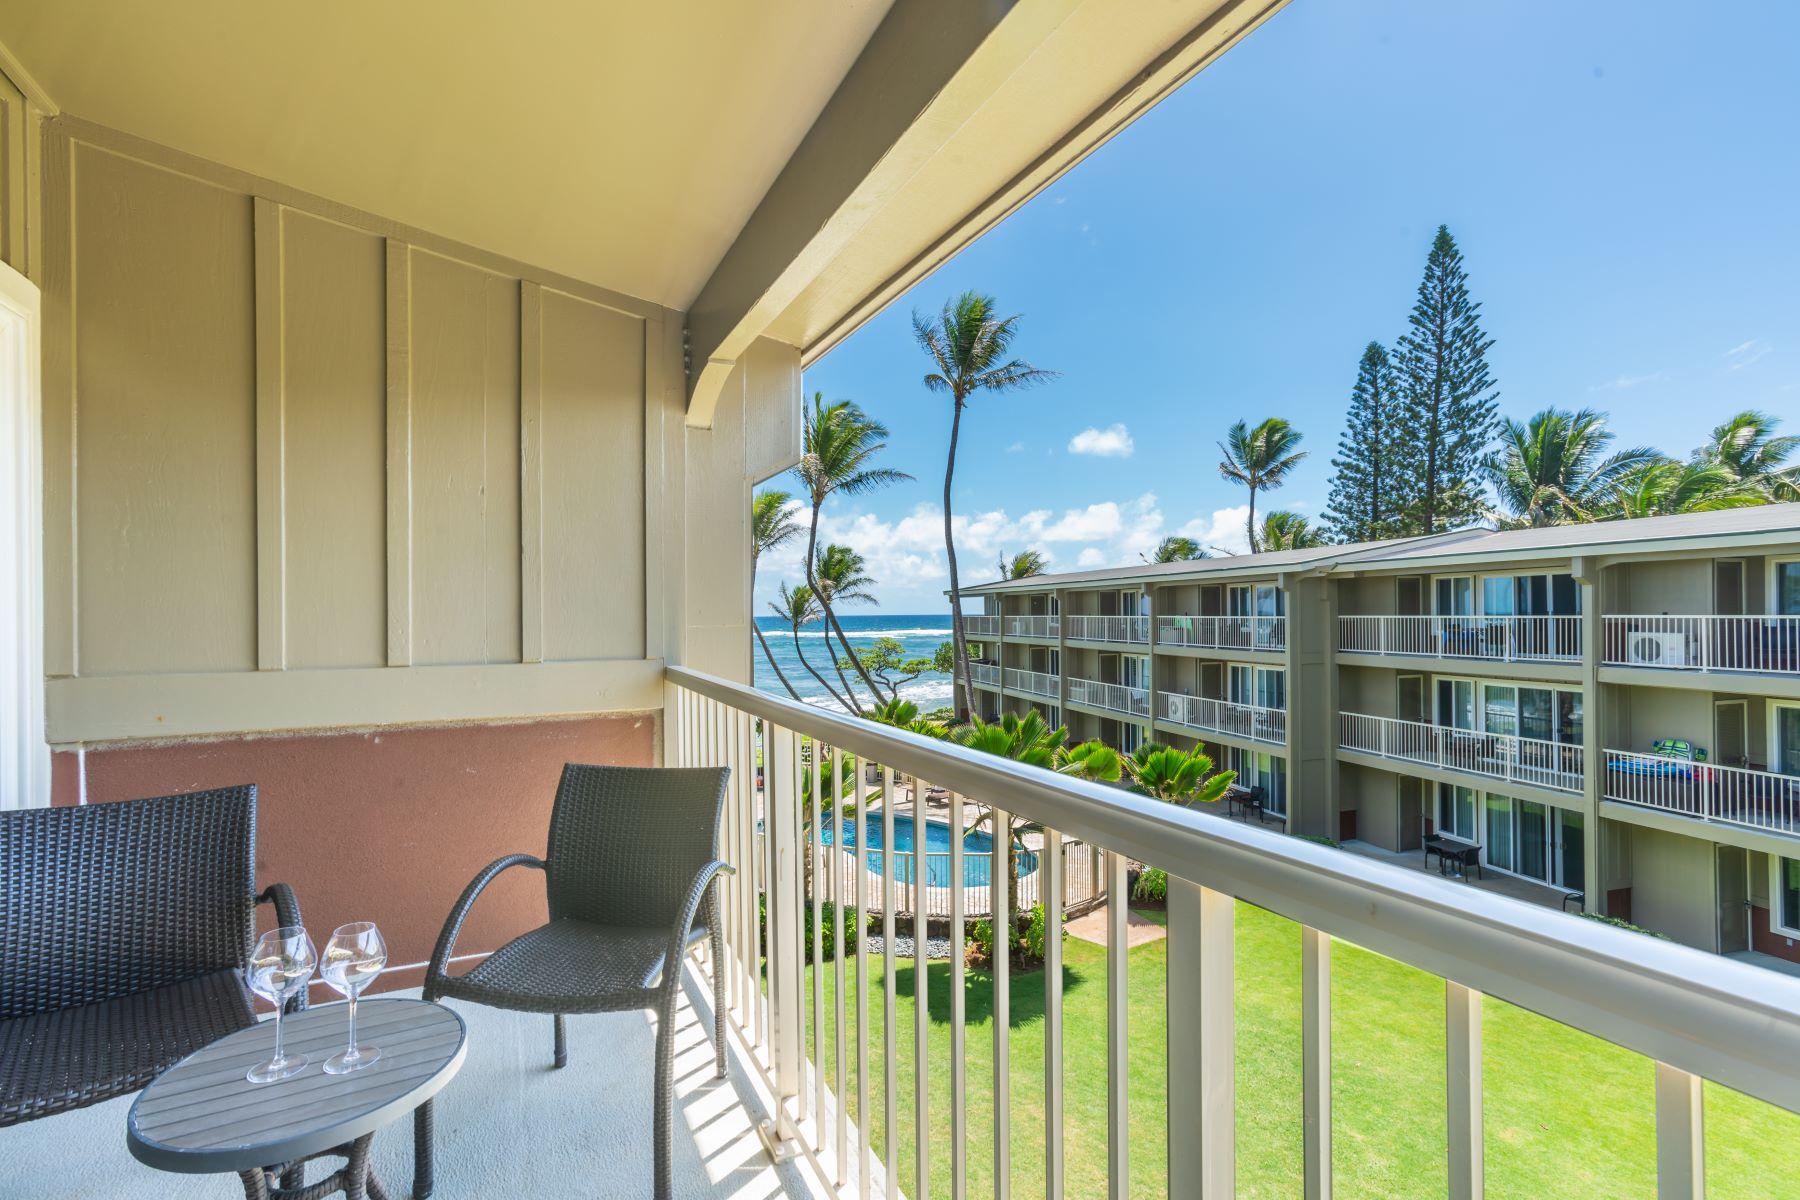 Condominiums 为 销售 在 4-856 KUHIO HWY #311 KAPAA, HI 96746 4-856 KUHIO HWY #311 卡帕雅, 夏威夷 96746 美国